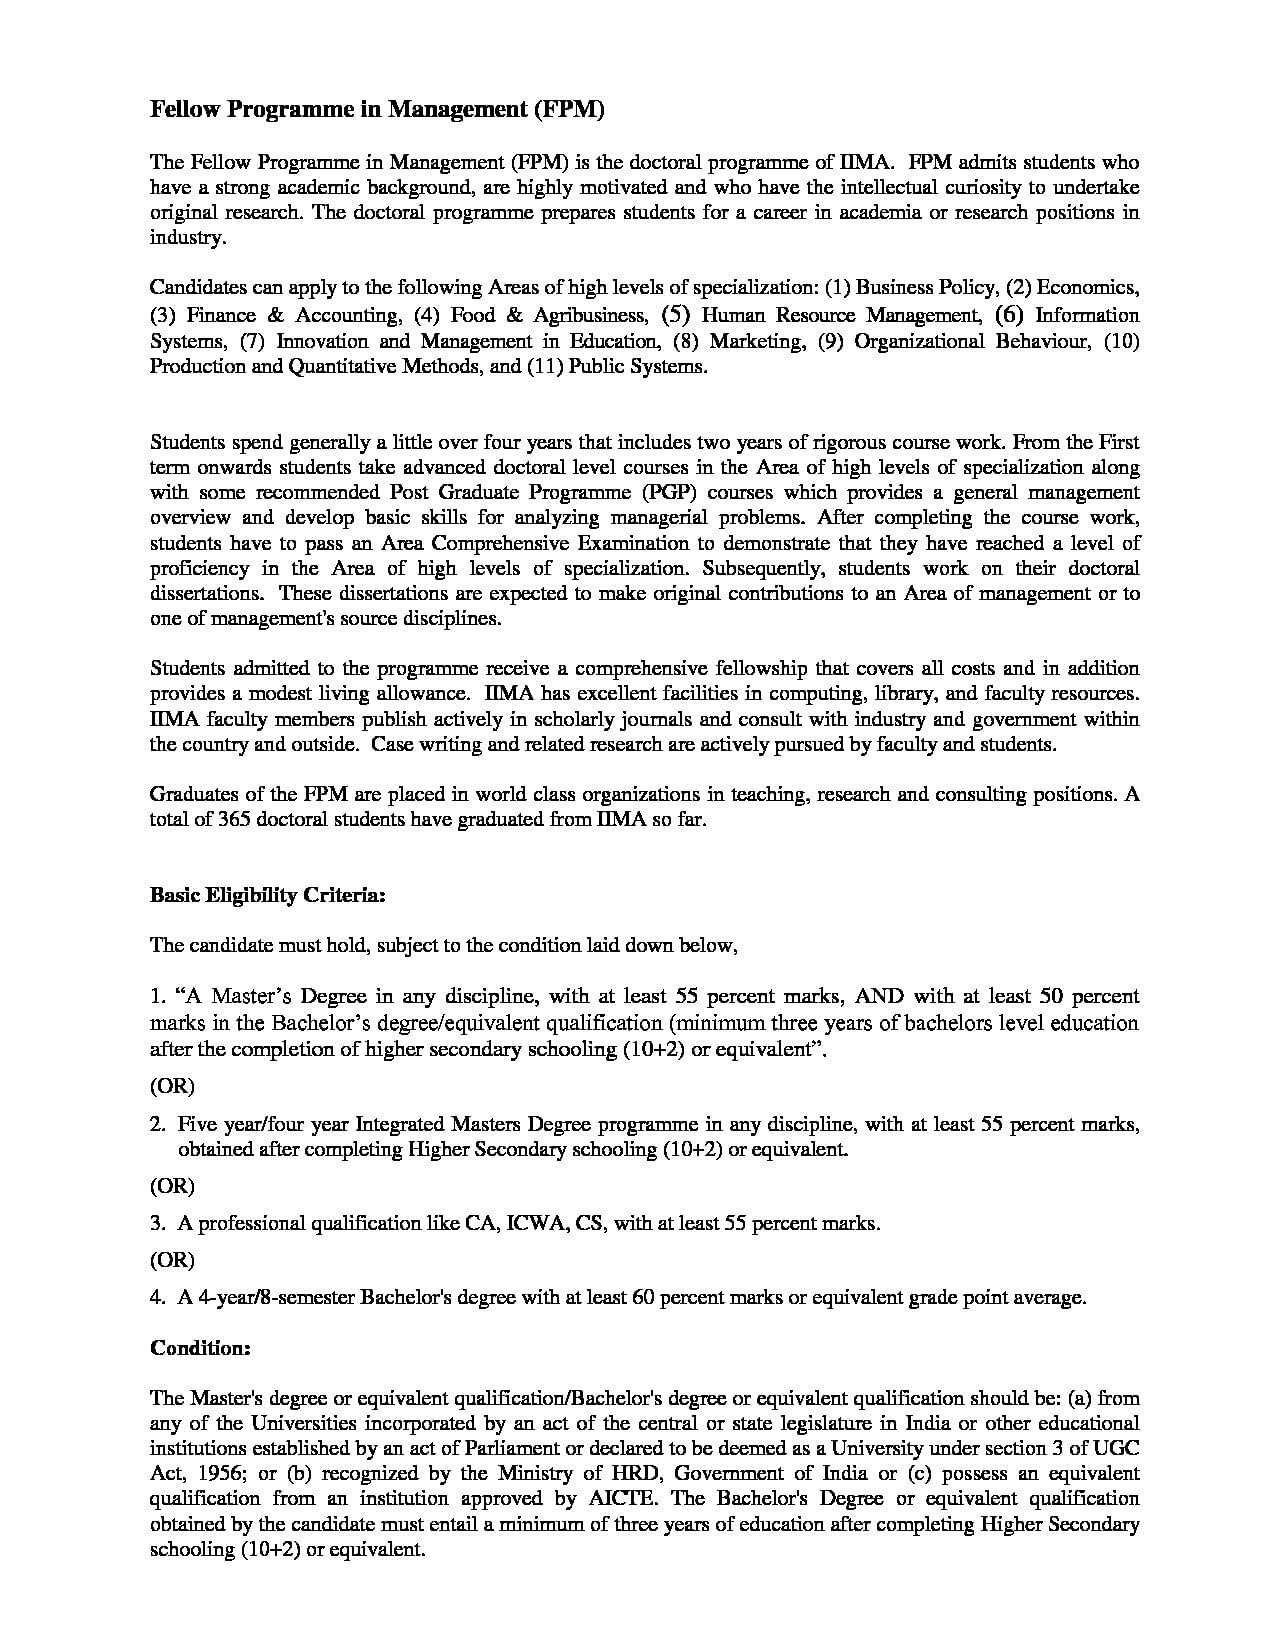 IIM Ahmedabad - Fees, Courses, Admission, Cut Off 2019